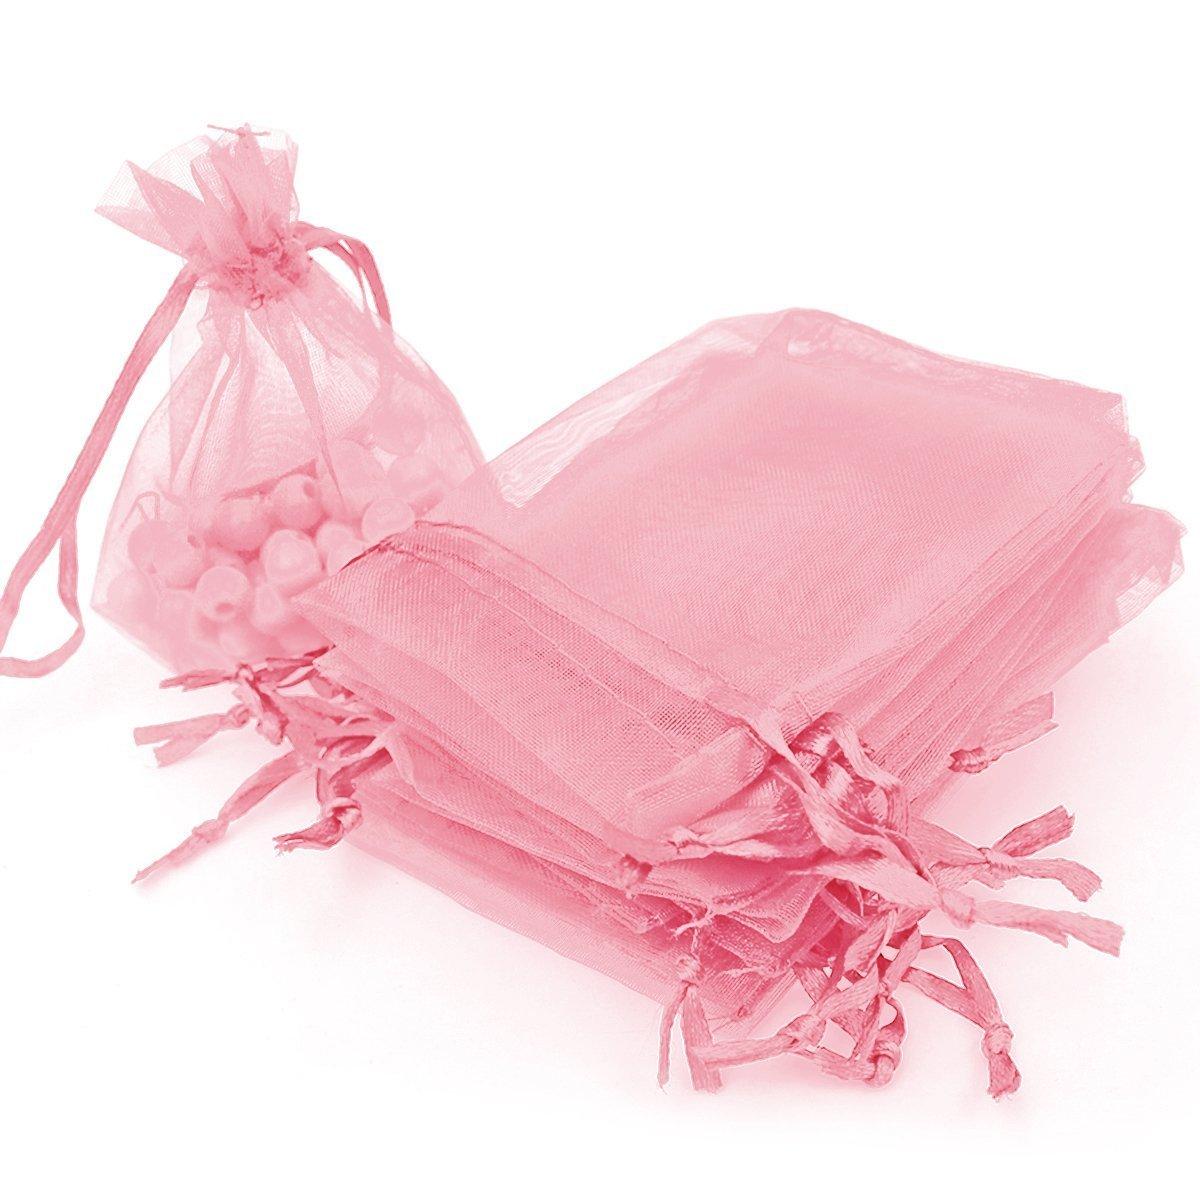 Viatabuna Organza Bags 100pcs 4 x 6 Inch Gift Bags Organza ...